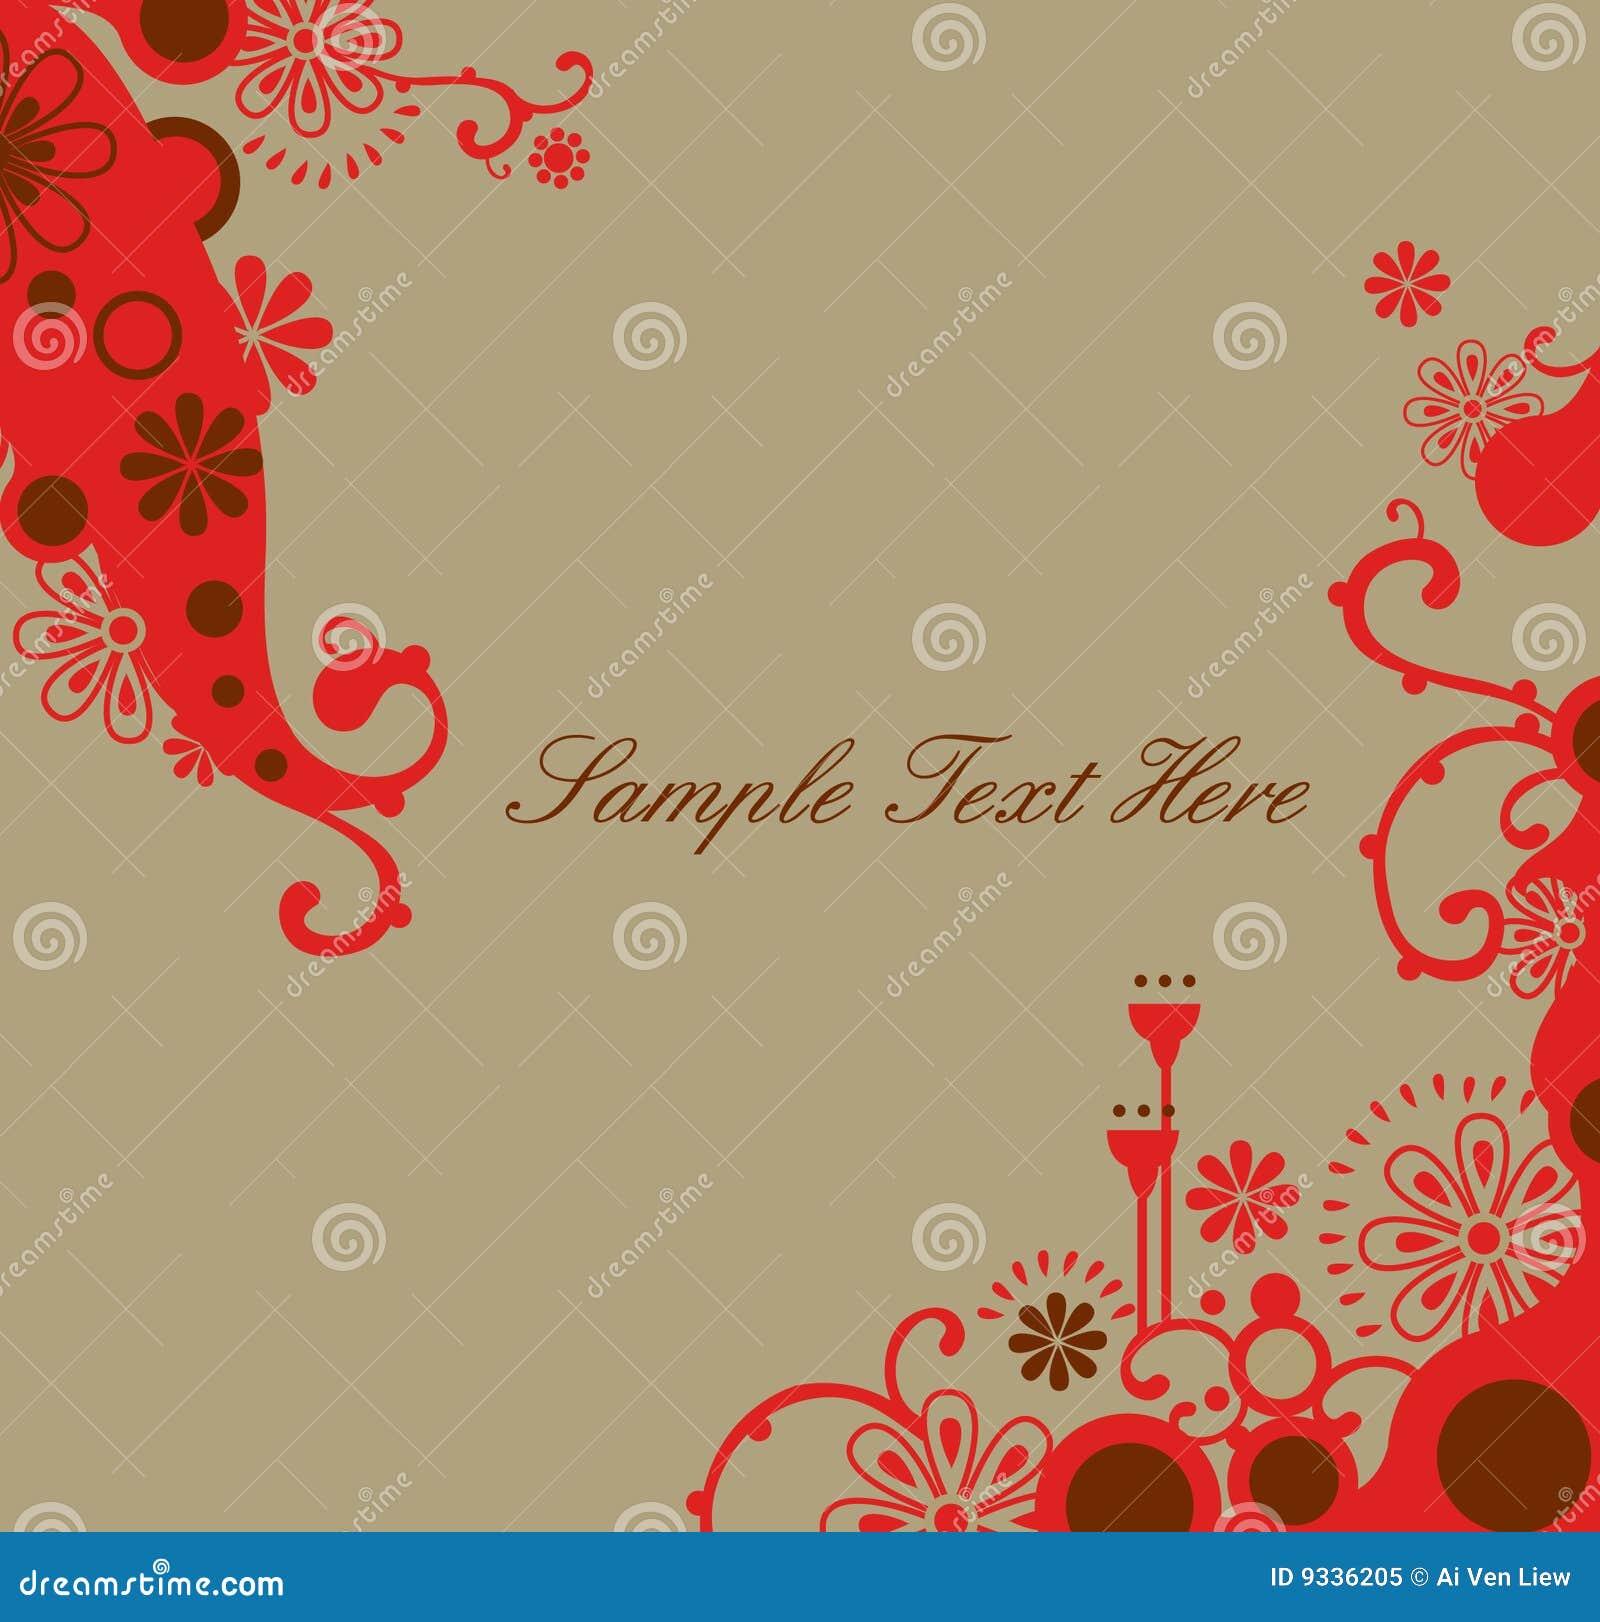 sweet red border design royalty free stock photo